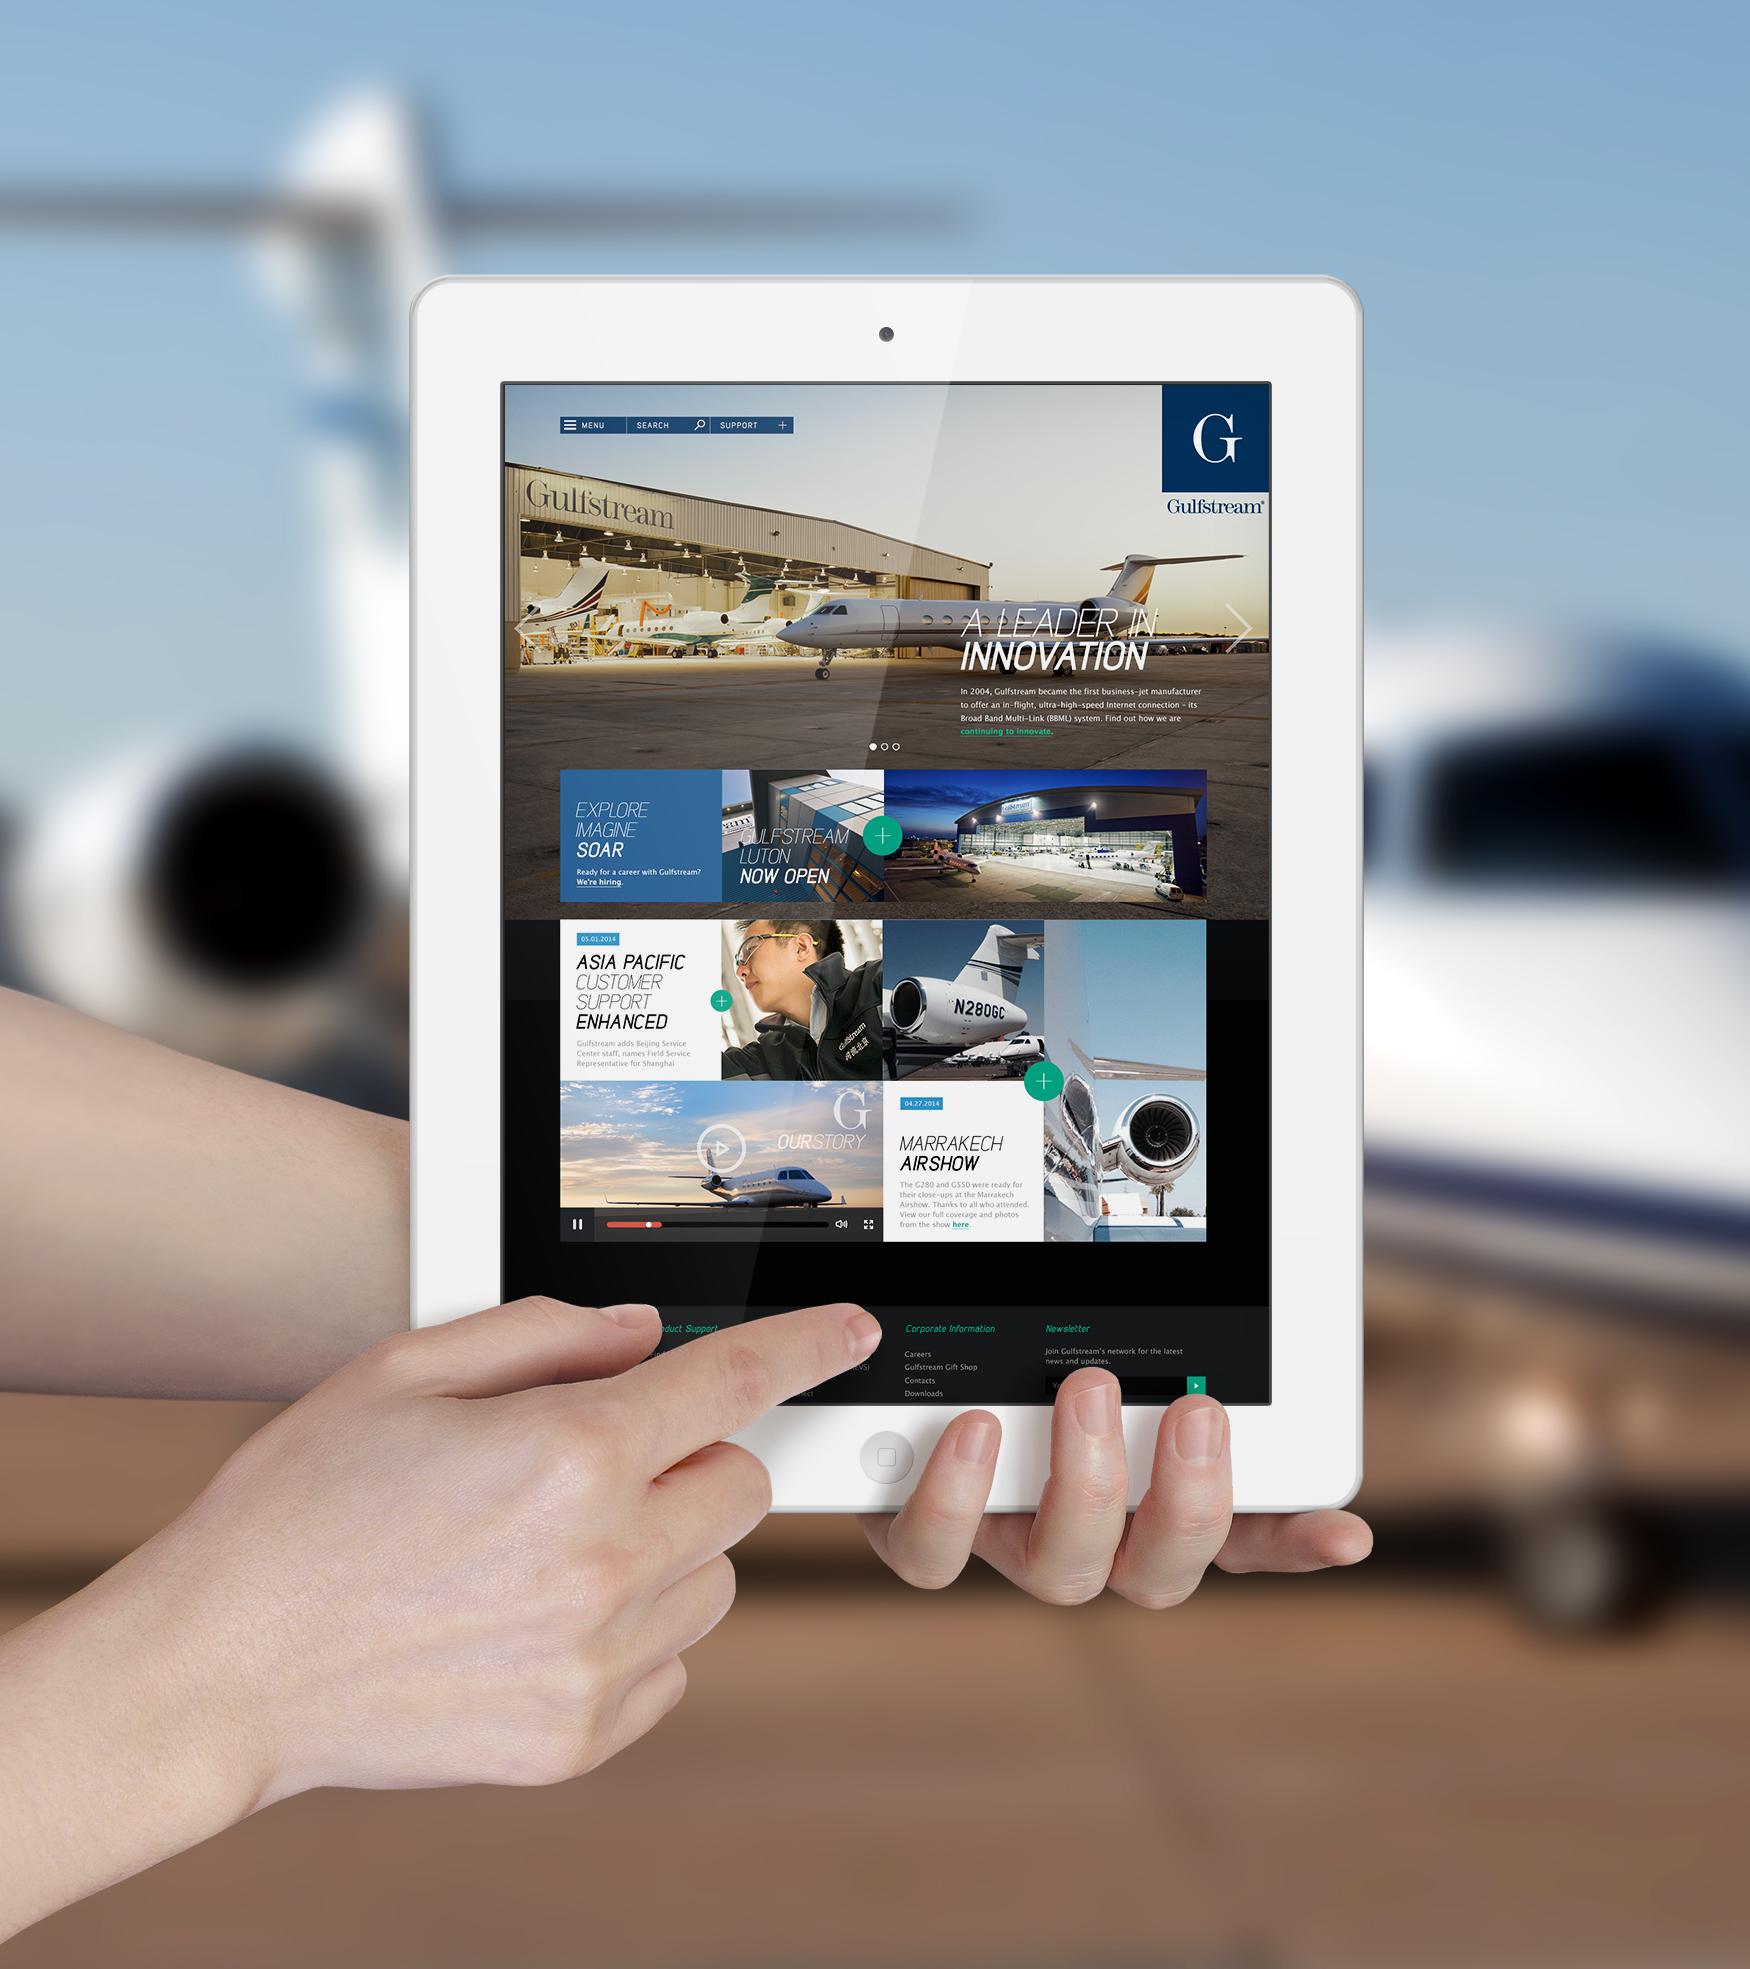 iPad Gulfstream example